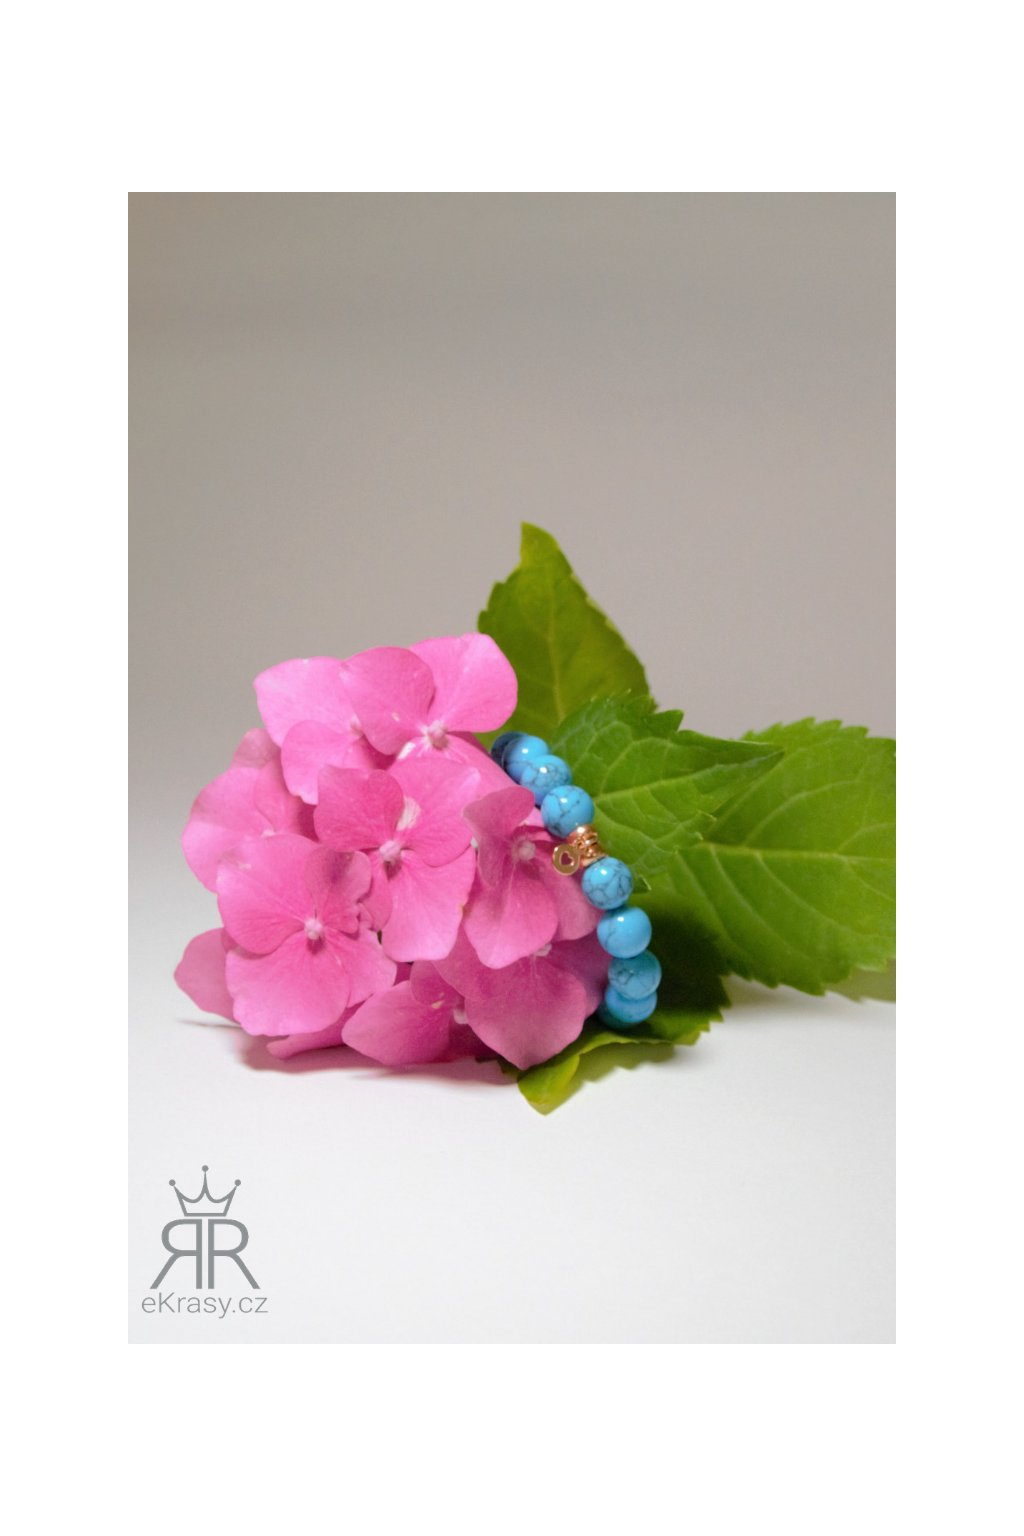 eKrasy náramek Modrý obláček - krásný dárek pro dítě